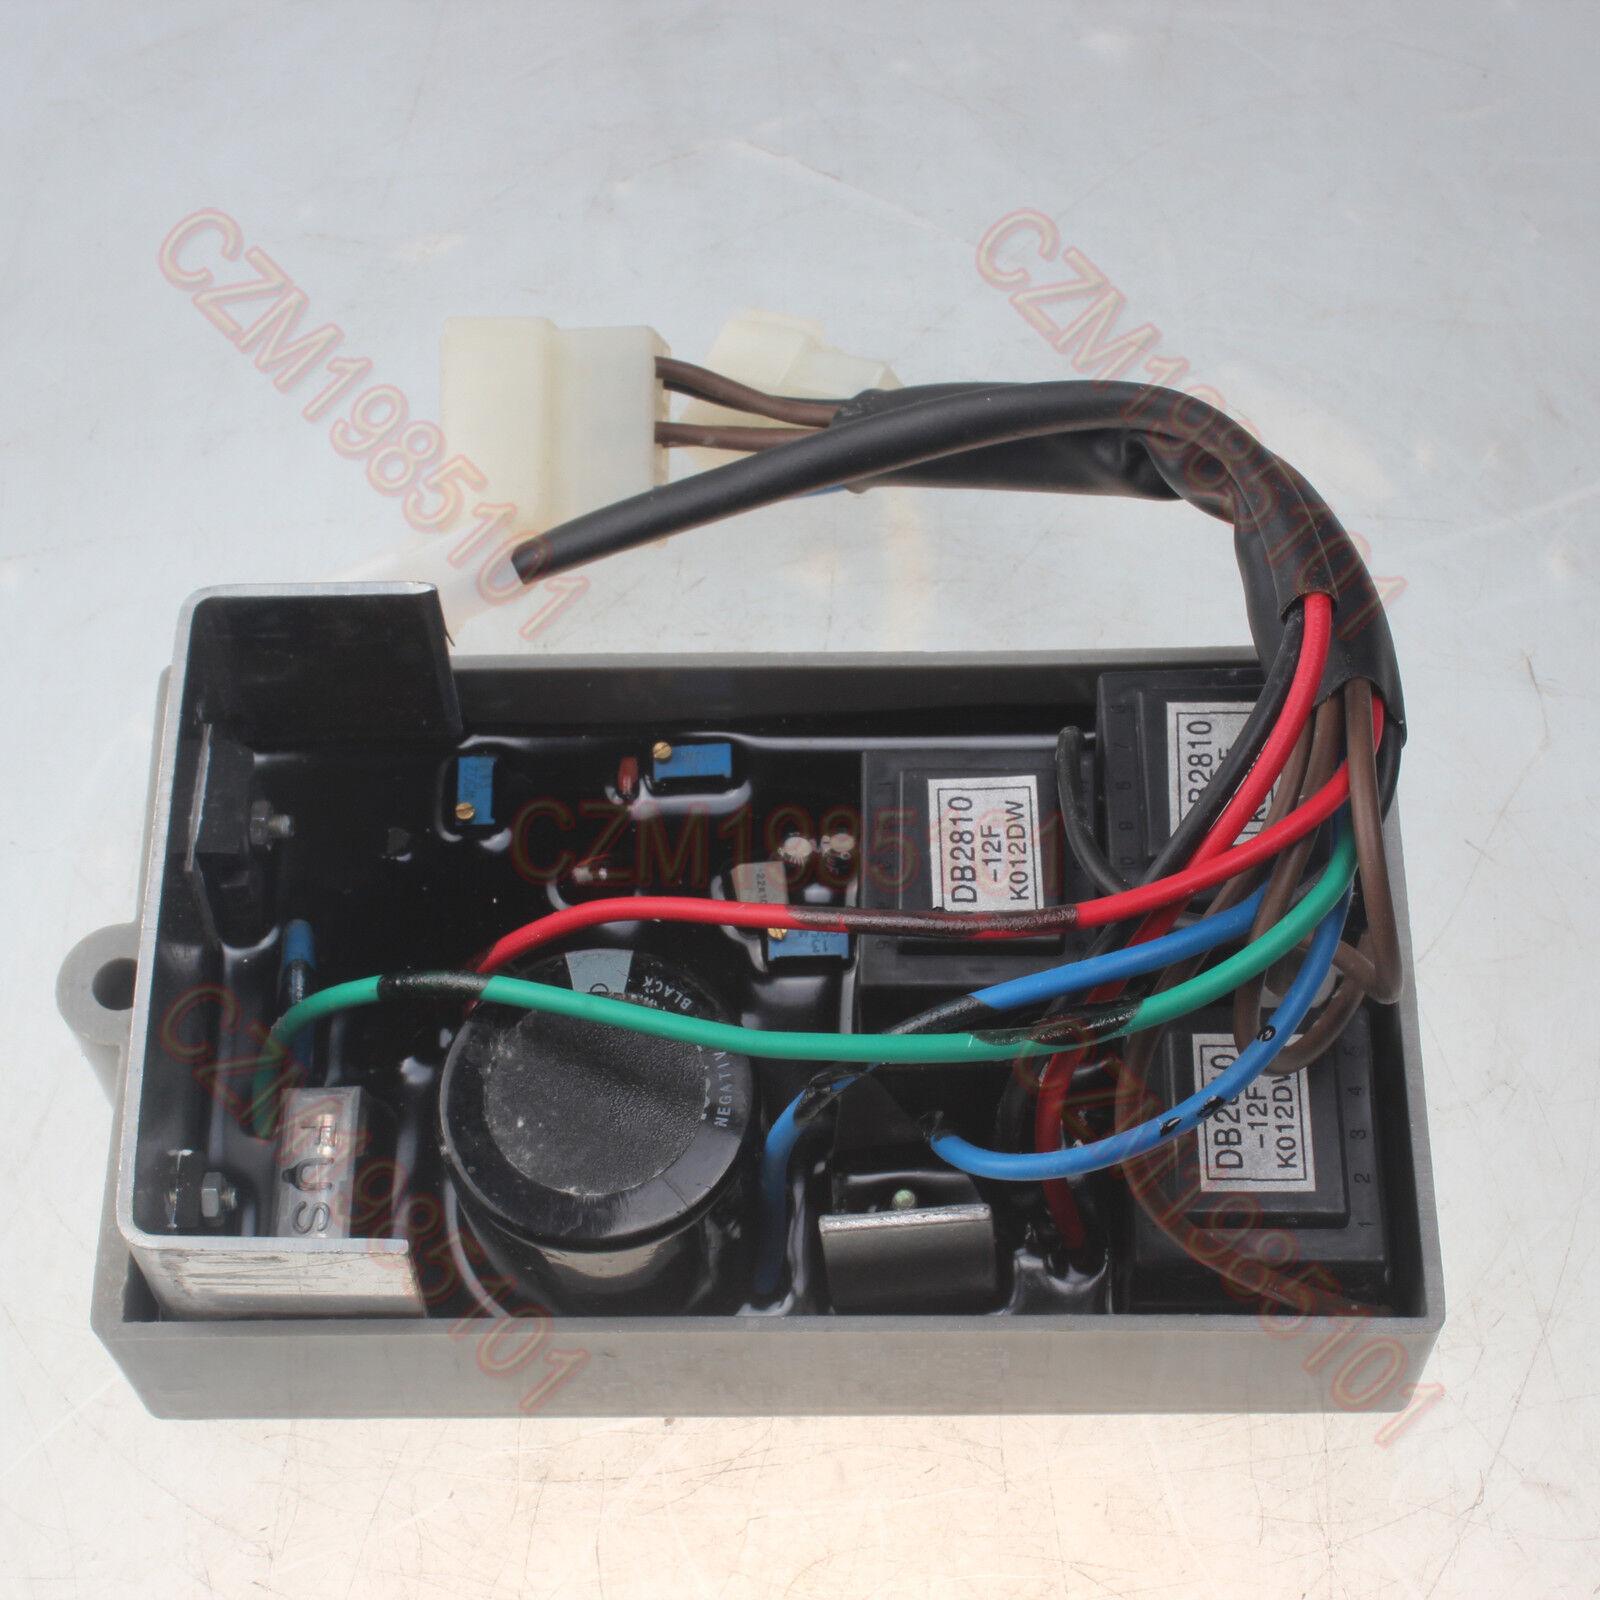 Voltage Regulator AVR KI DAVR 95S3 For KIPOR 3 Phase Diesel